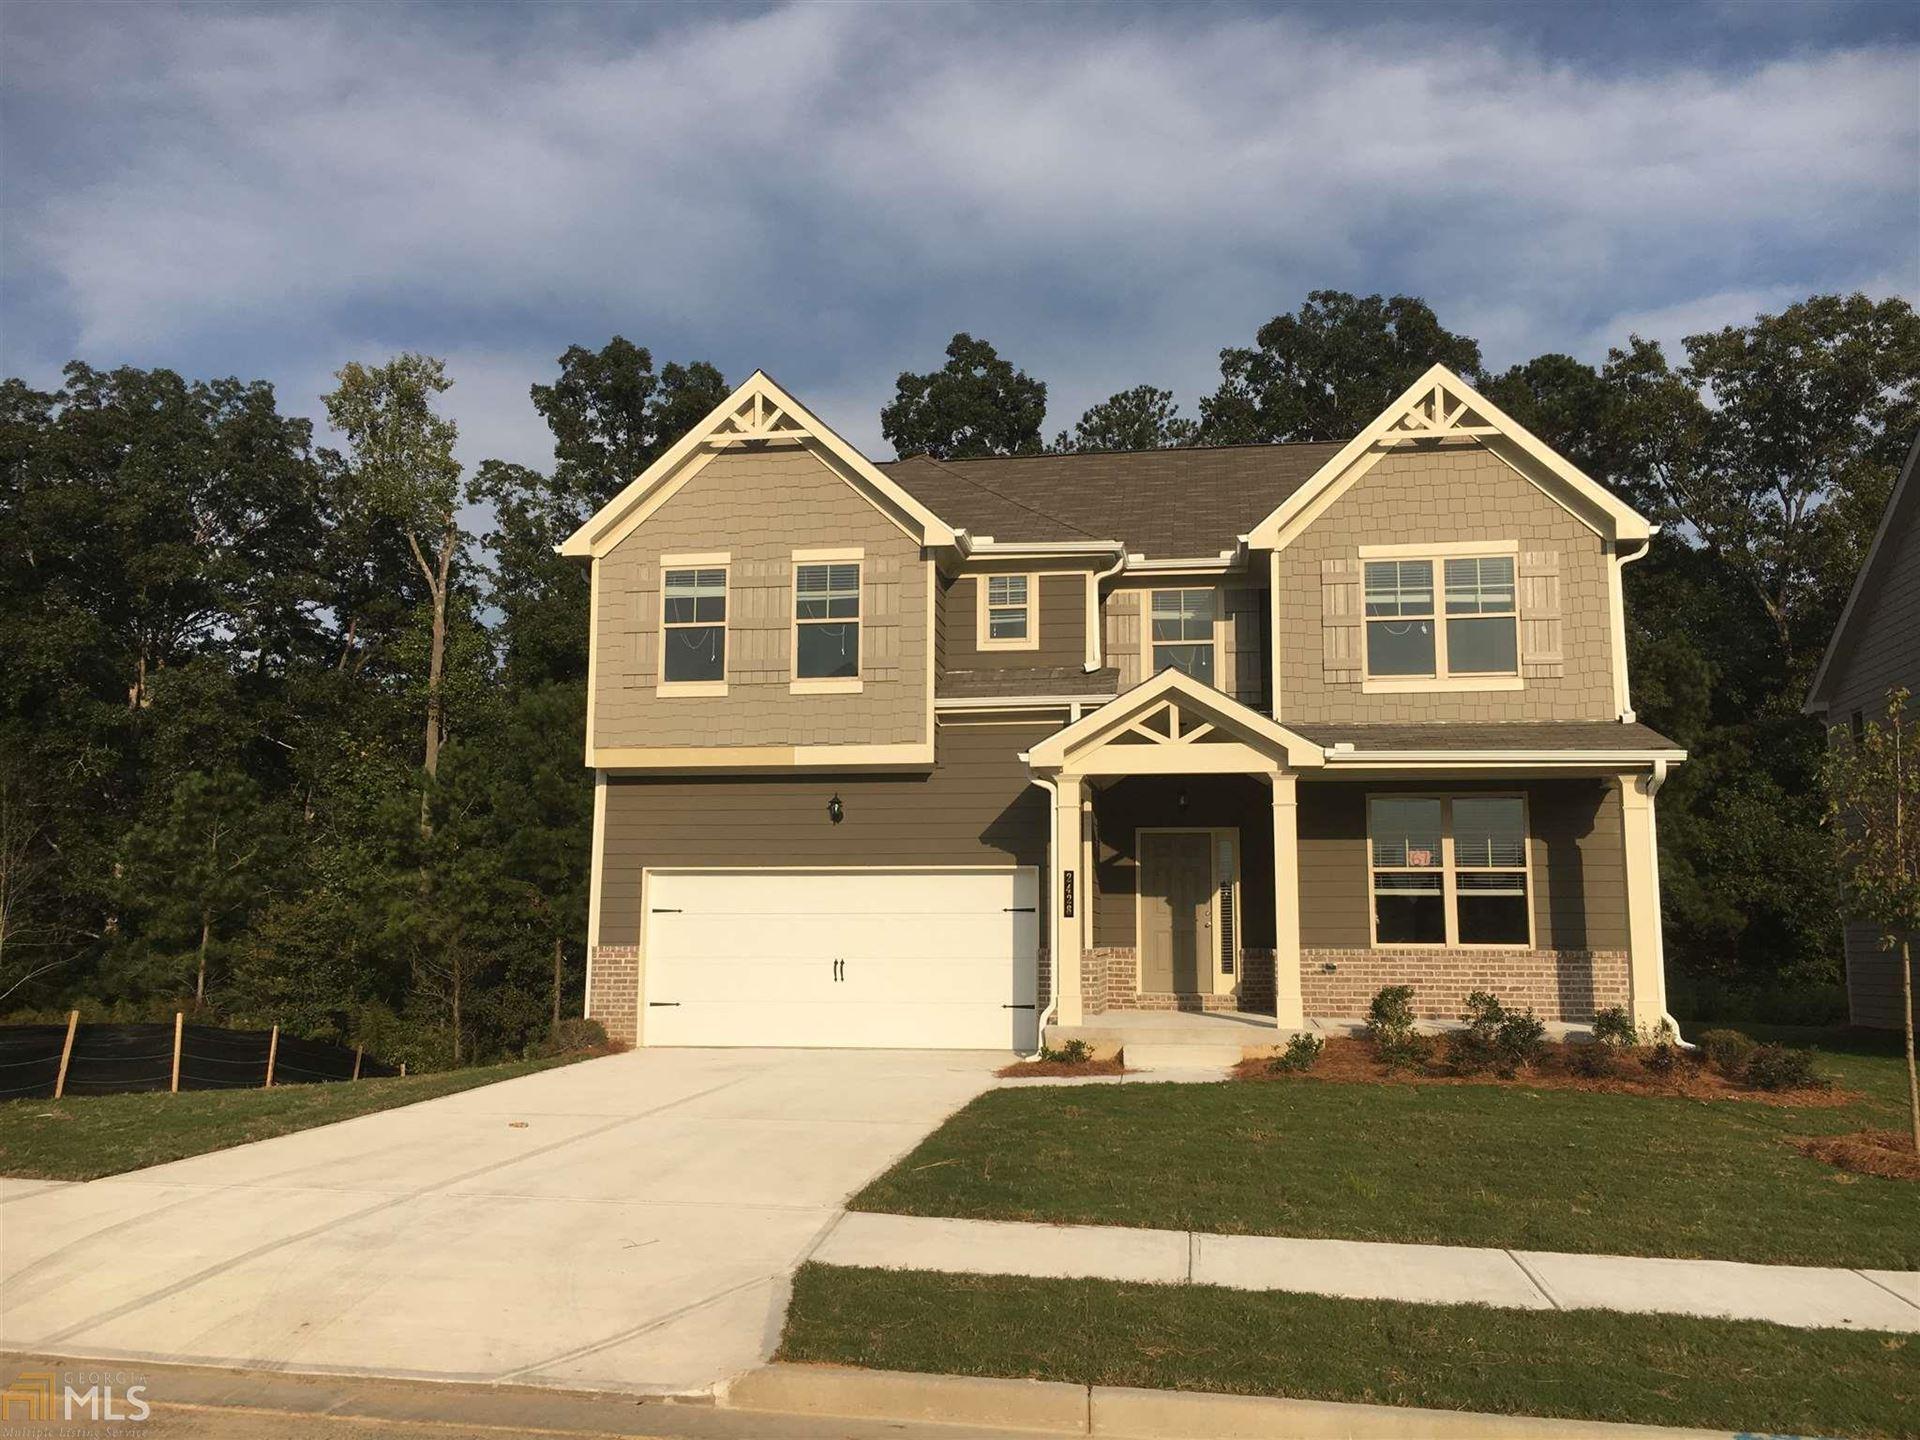 2428 Hanover Woods Rd, Lithonia, GA 30058 - #: 8868111